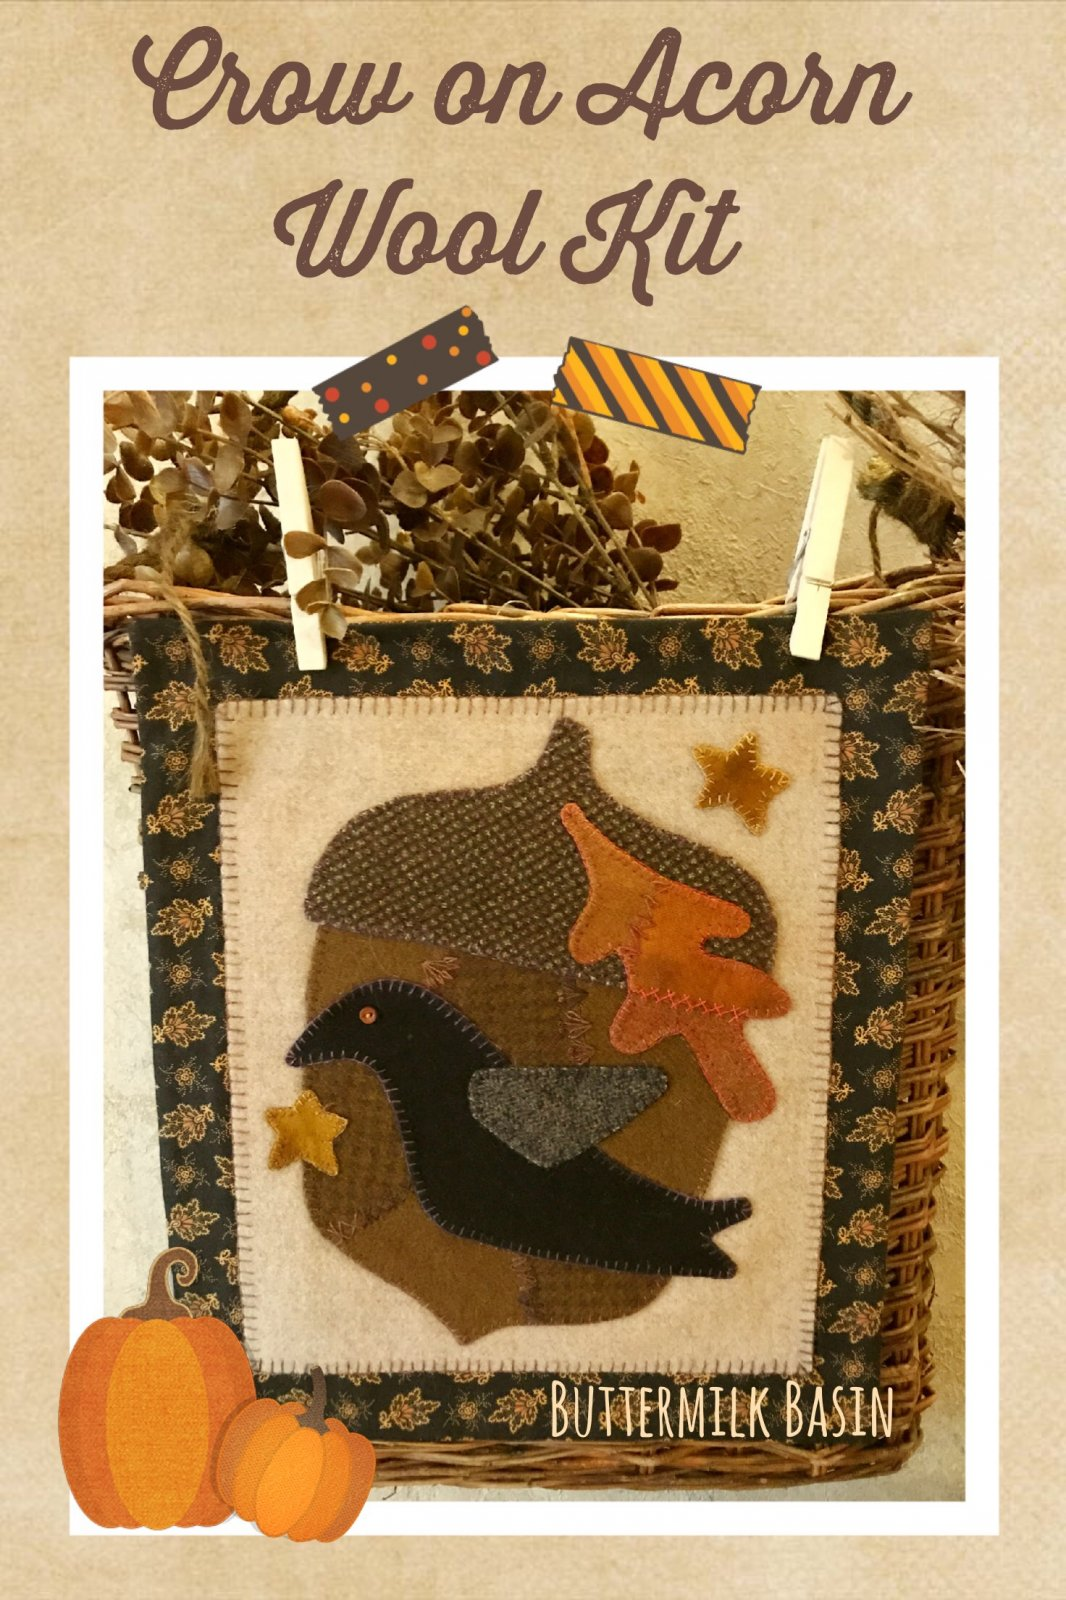 Crow on Acorn Wool Kit & Pattern